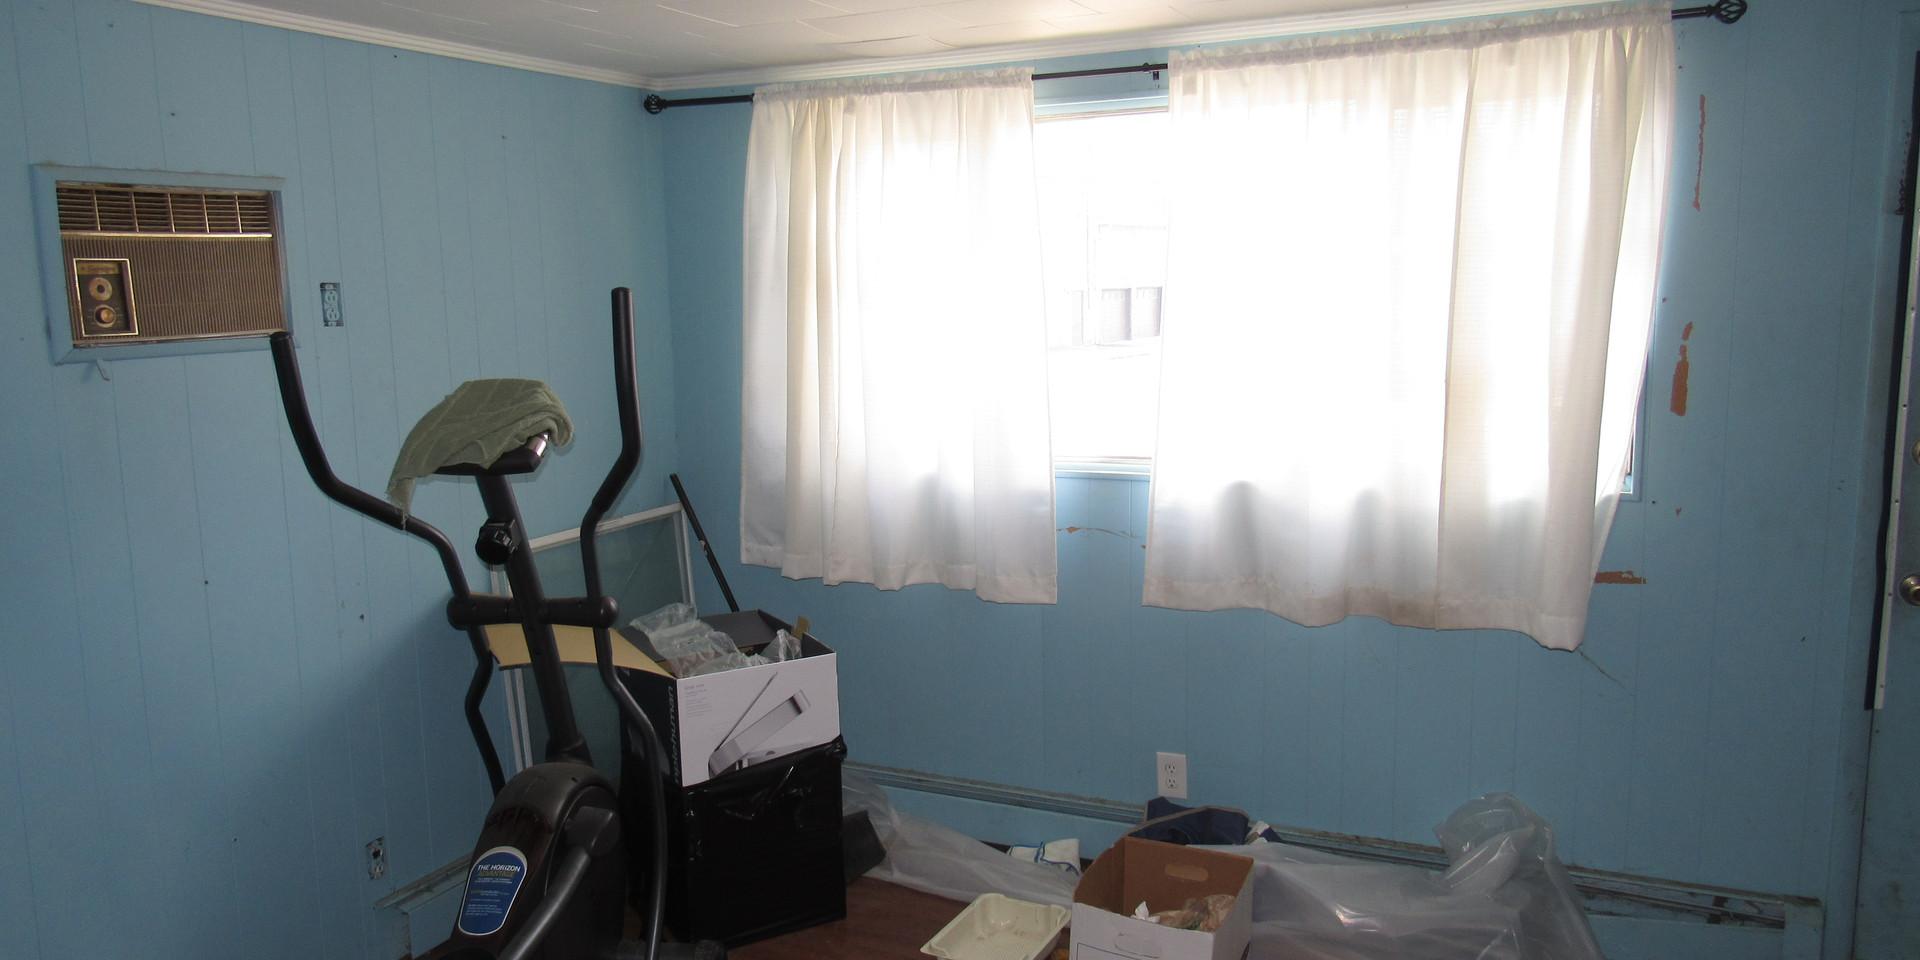 04 - Living Area Room Main Level A.JPG